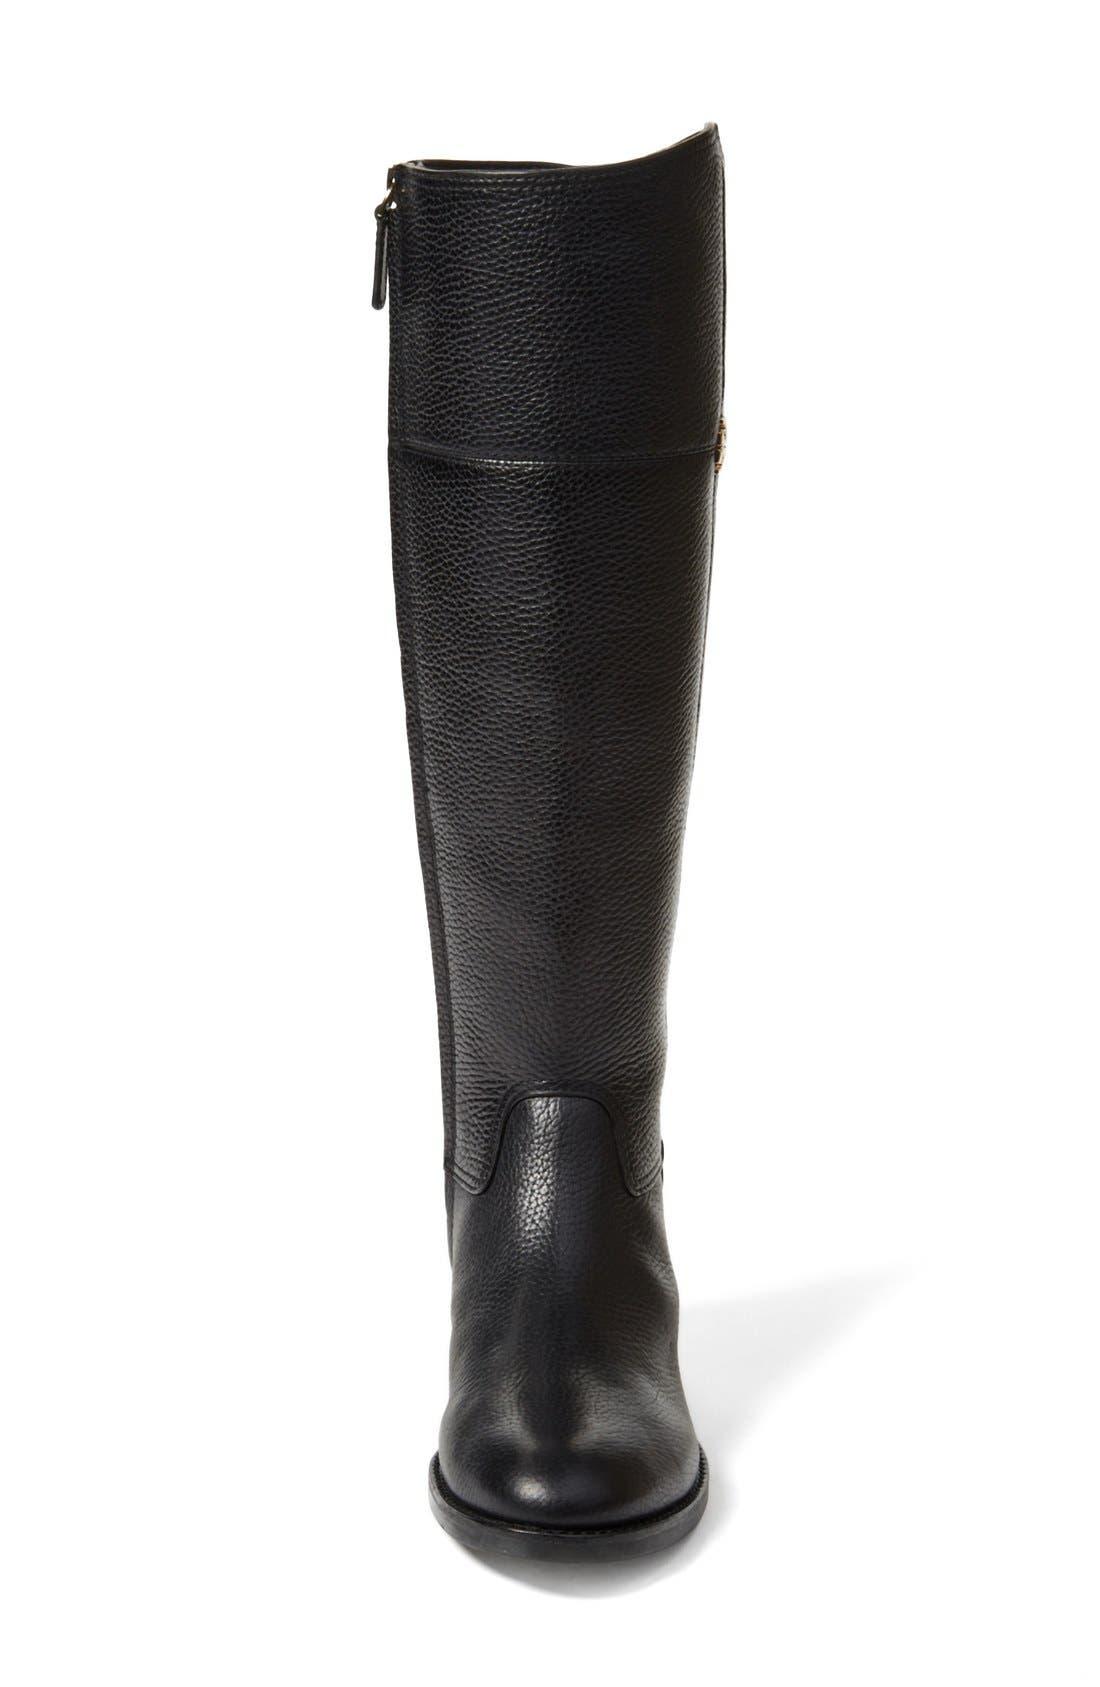 'Jolie' Riding Boot,                             Alternate thumbnail 3, color,                             Black Tumbled Leather